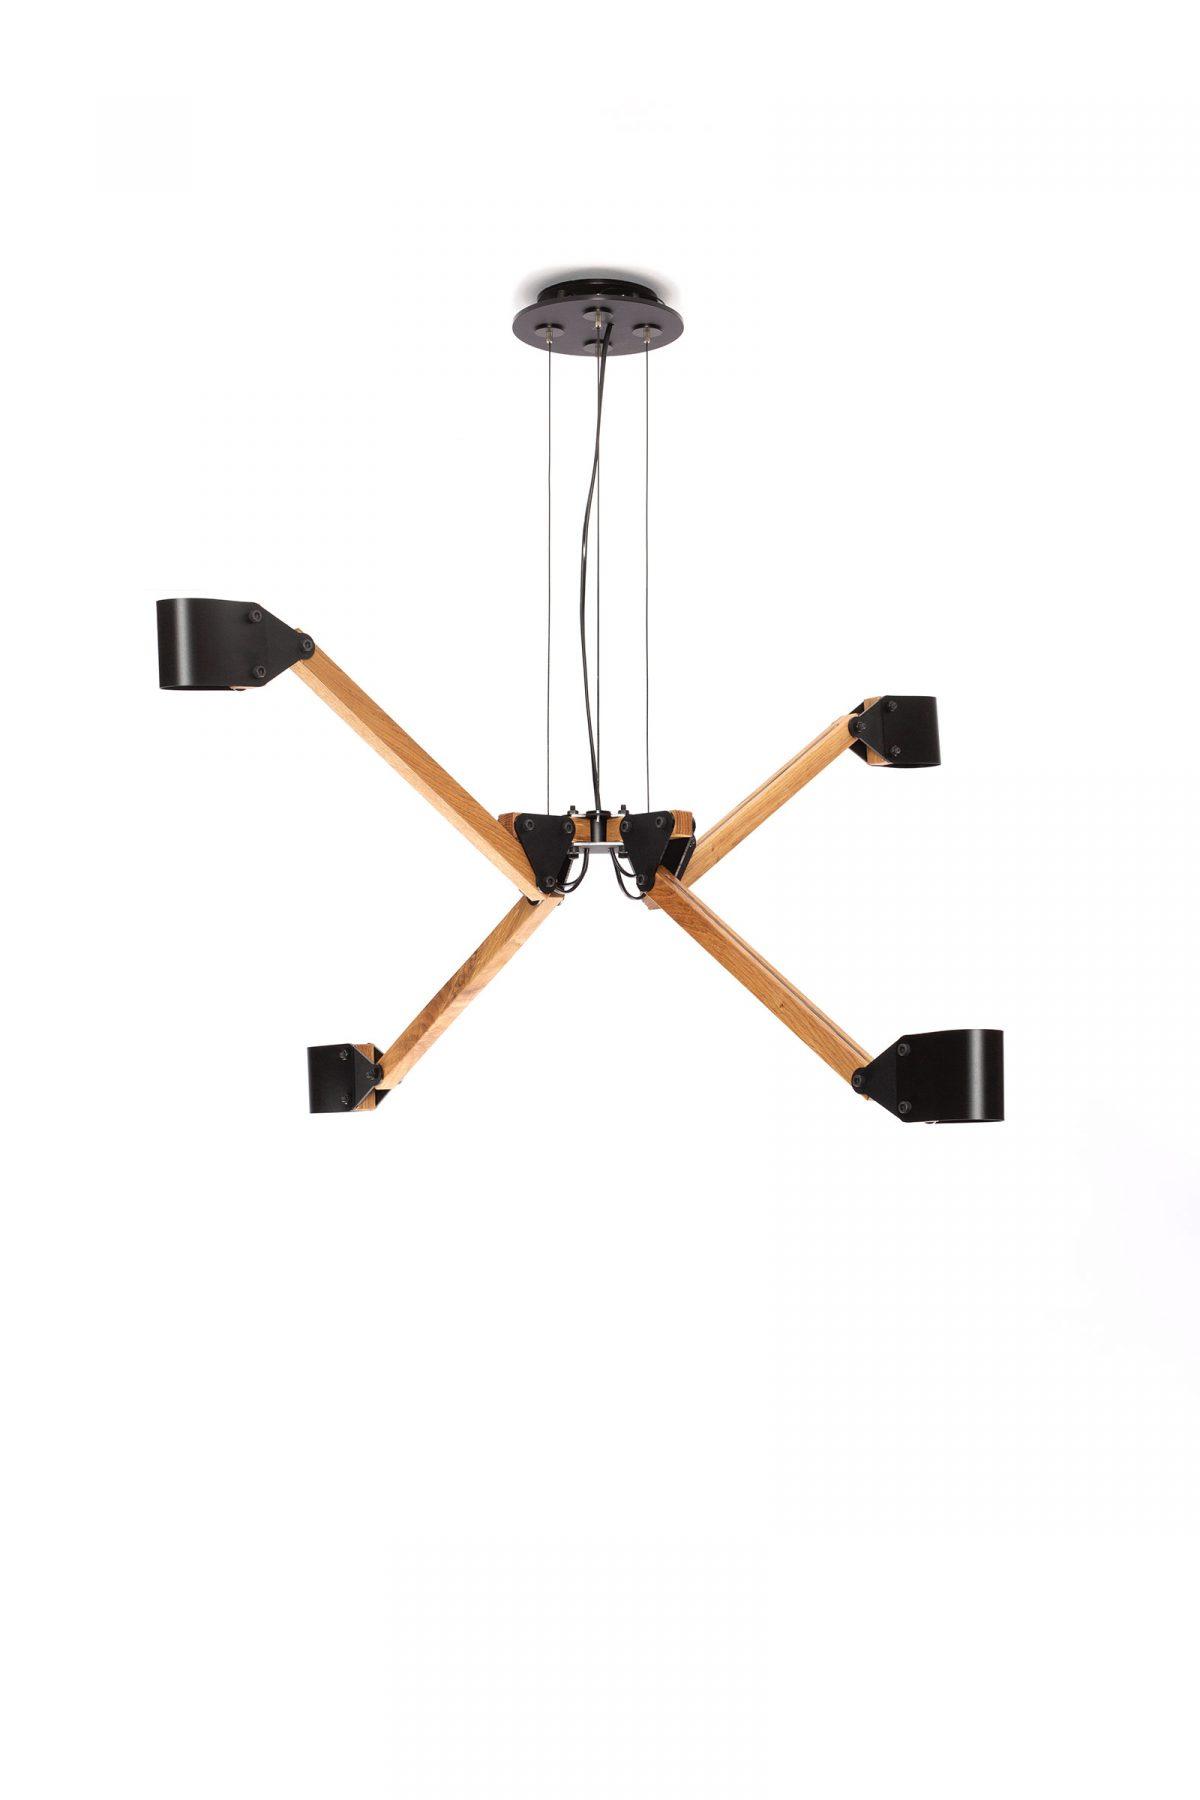 Triangle Plafond Kroonluchter Quatro Eikenhout Zijaanzicht